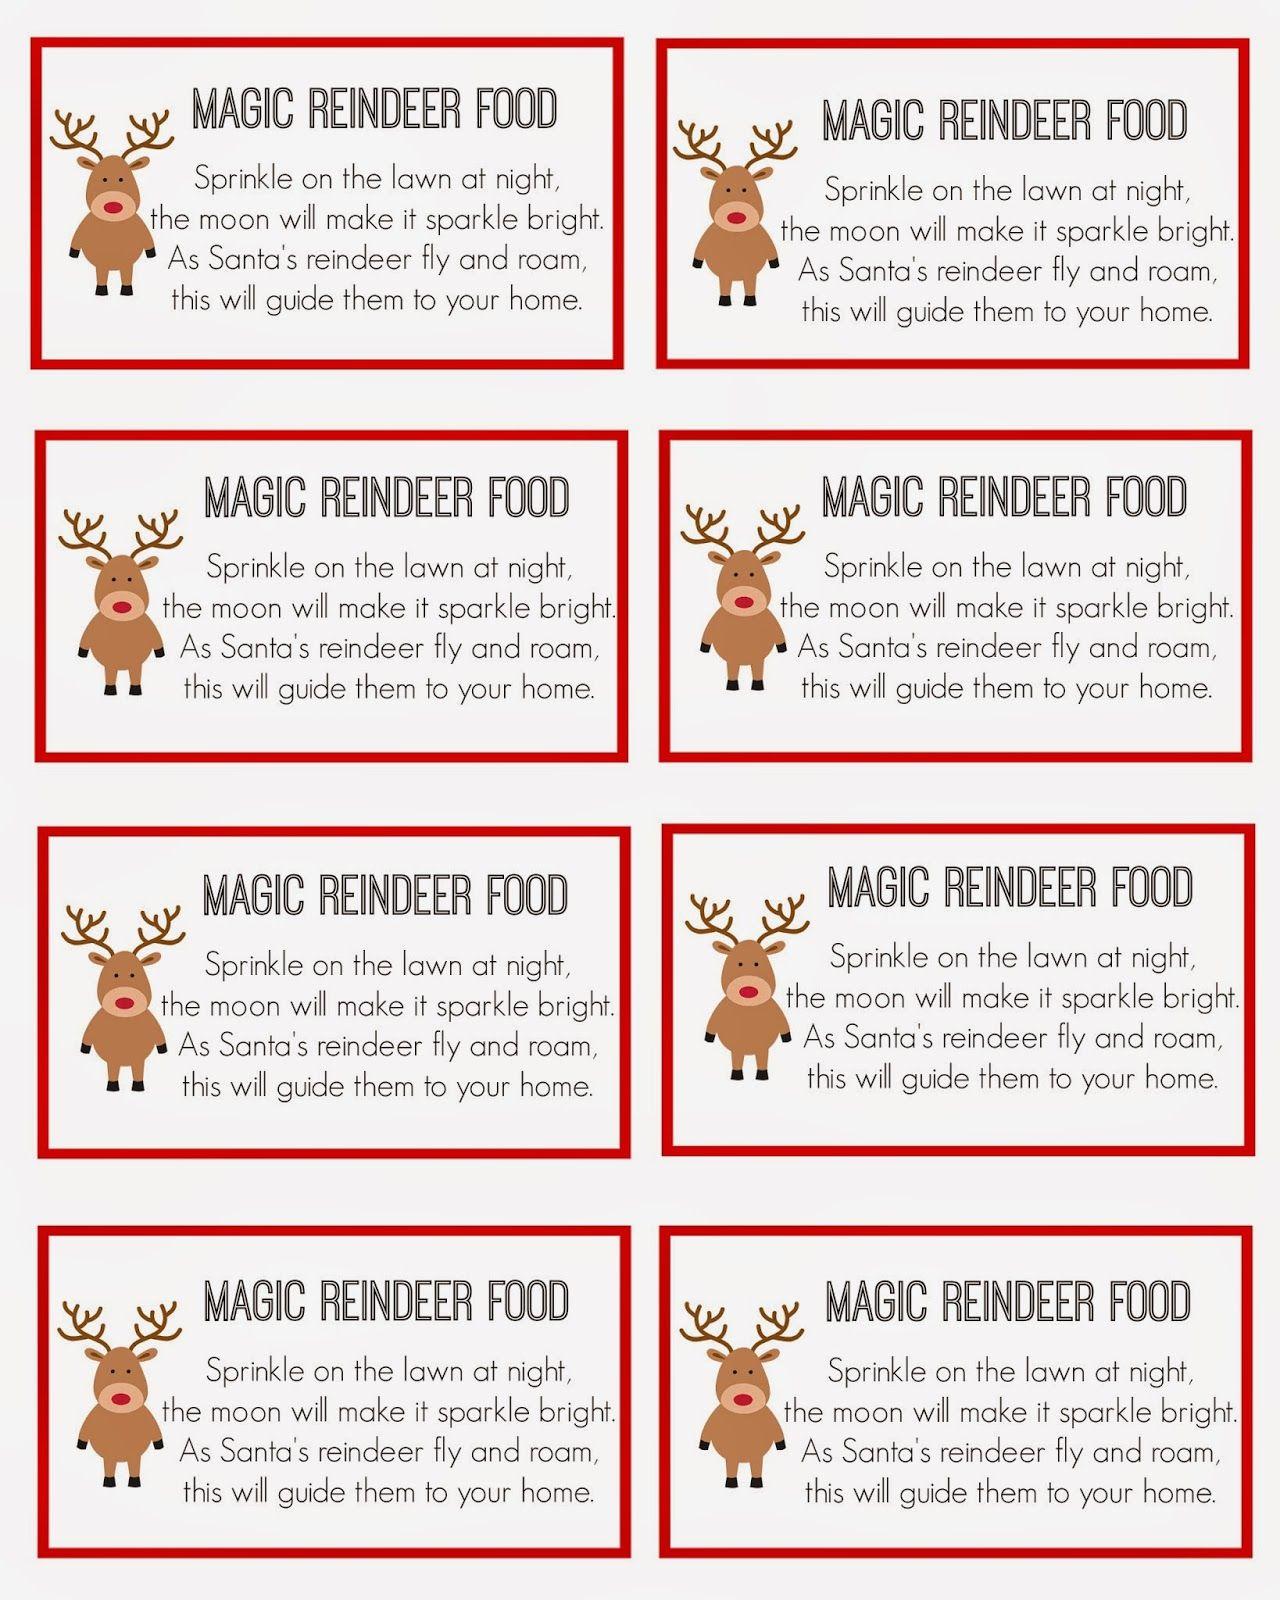 Magic Reindeer Food   Christmas   Magic Reindeer Food, Reindeer Food - Reindeer Food Poem Free Printable